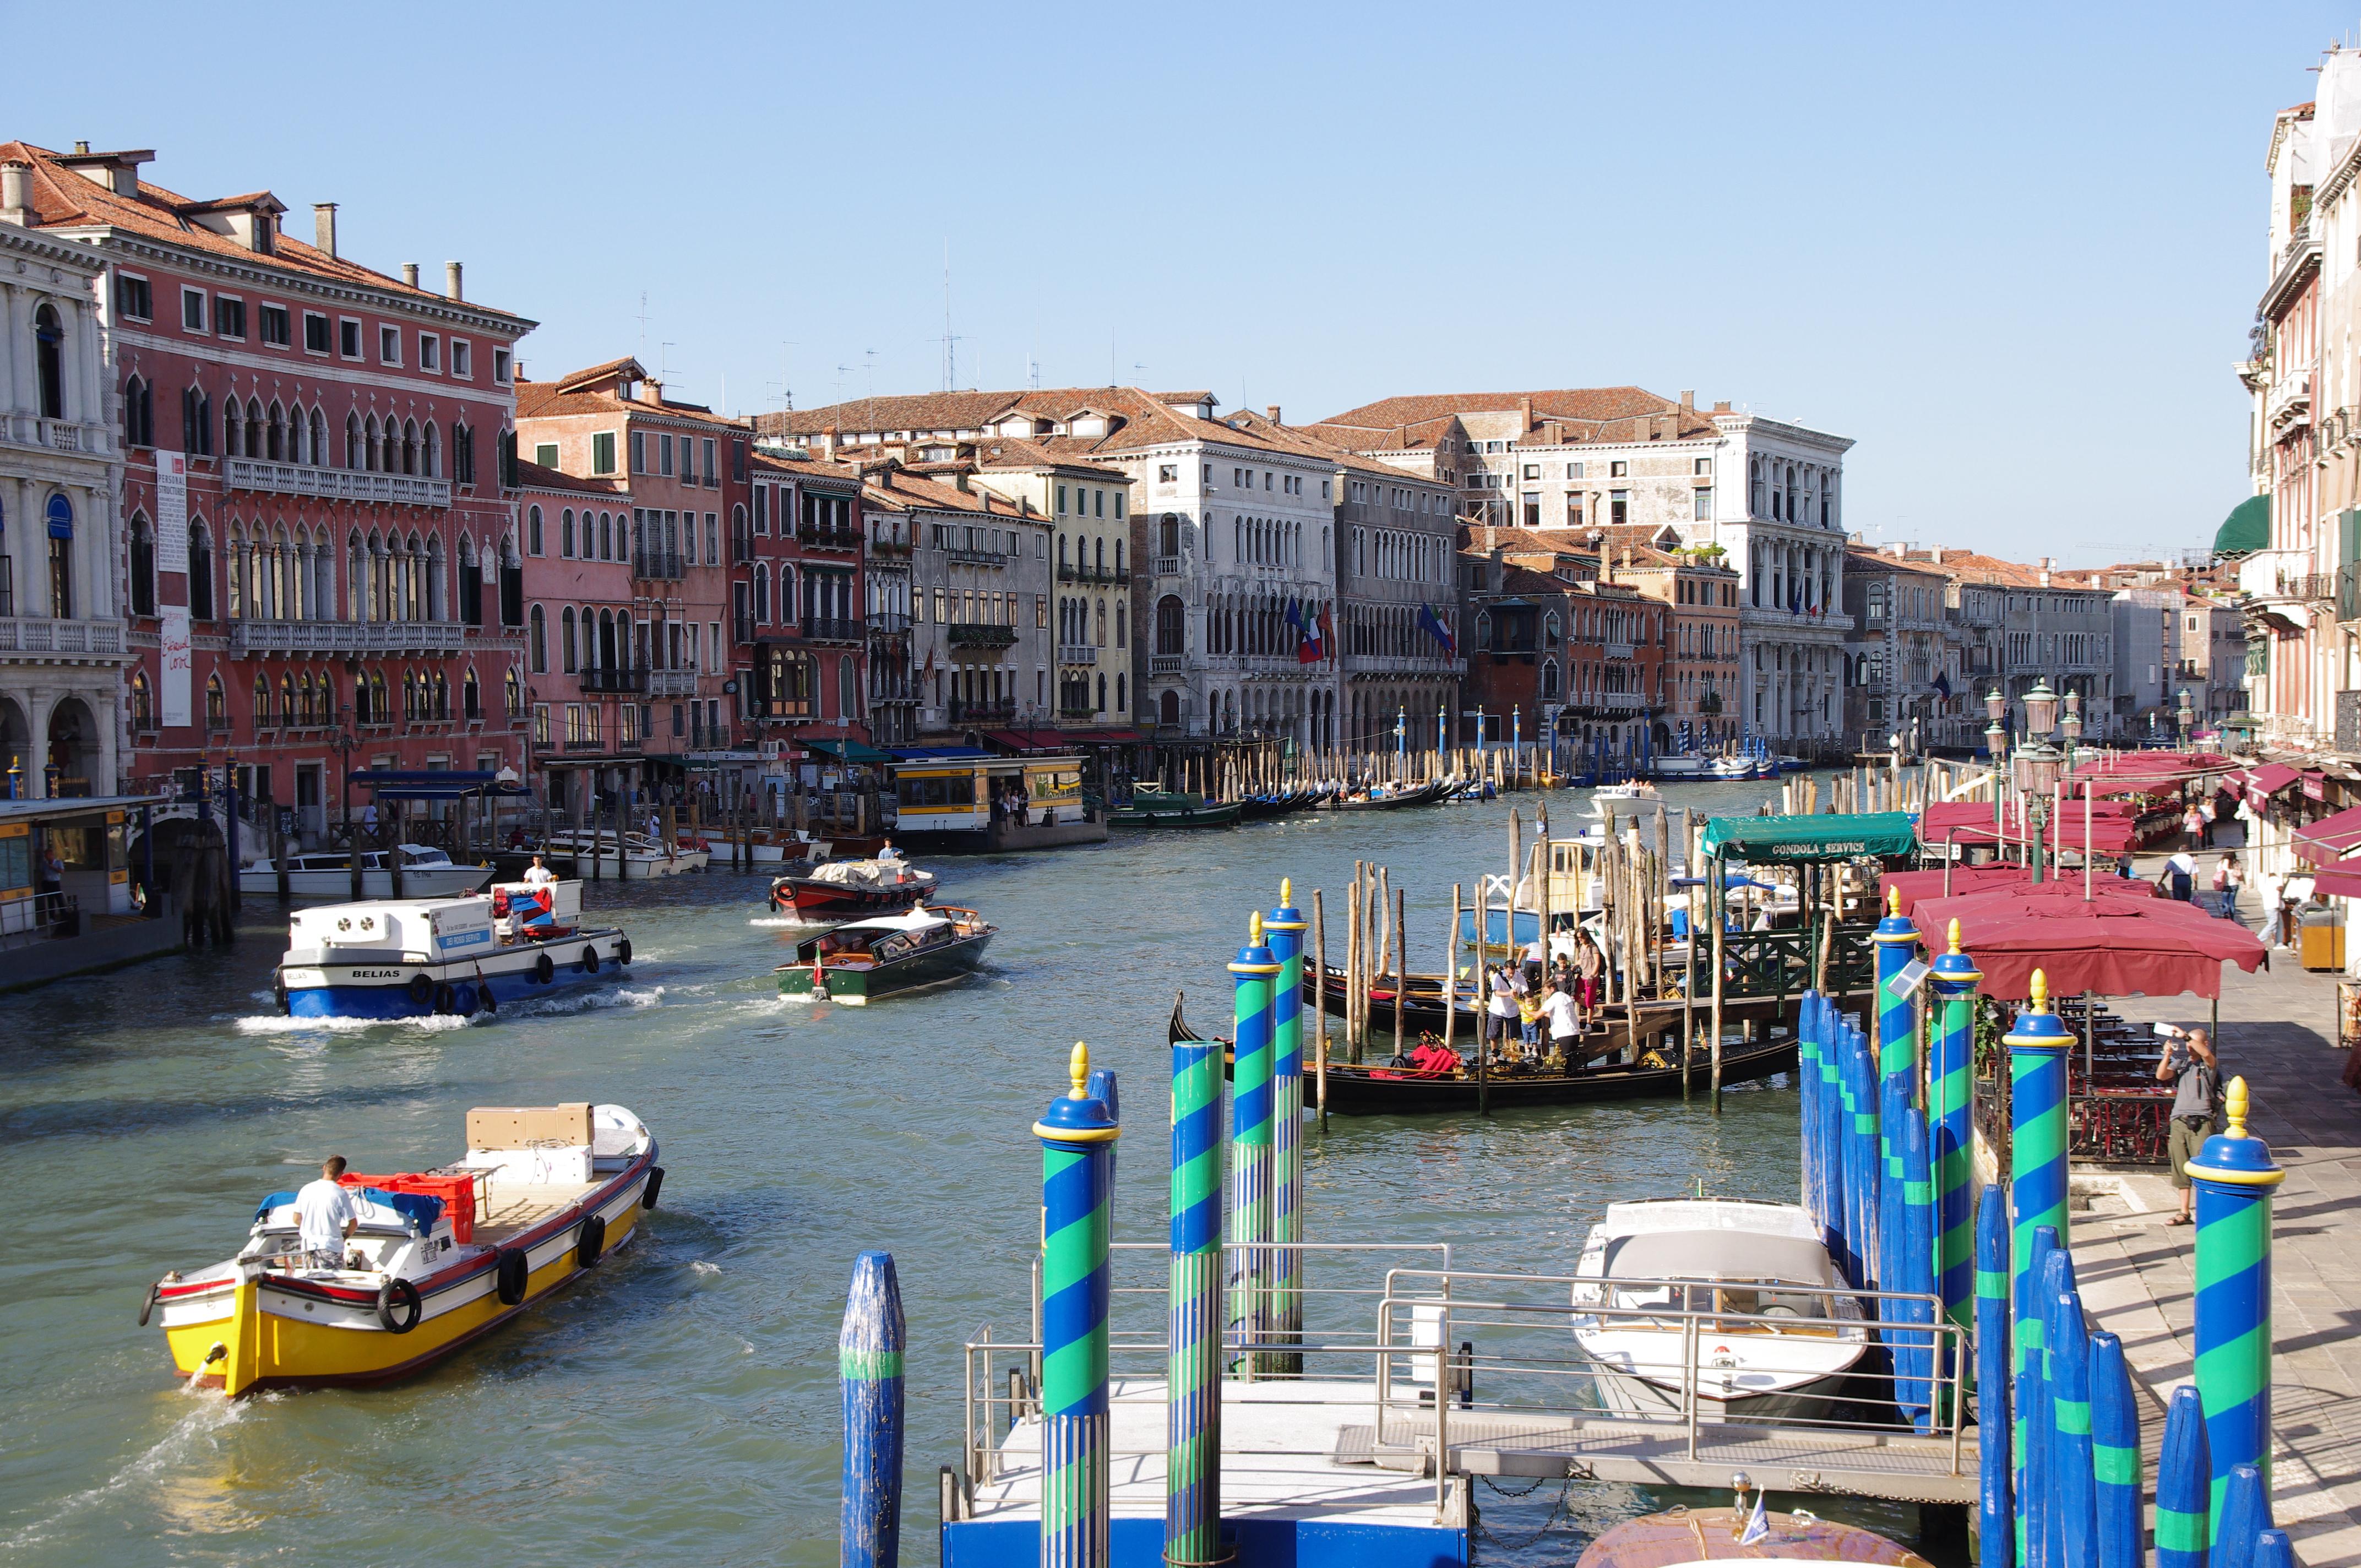 File:20110722 Venice Canal Grande 4068.jpg - Wikimedia Commons